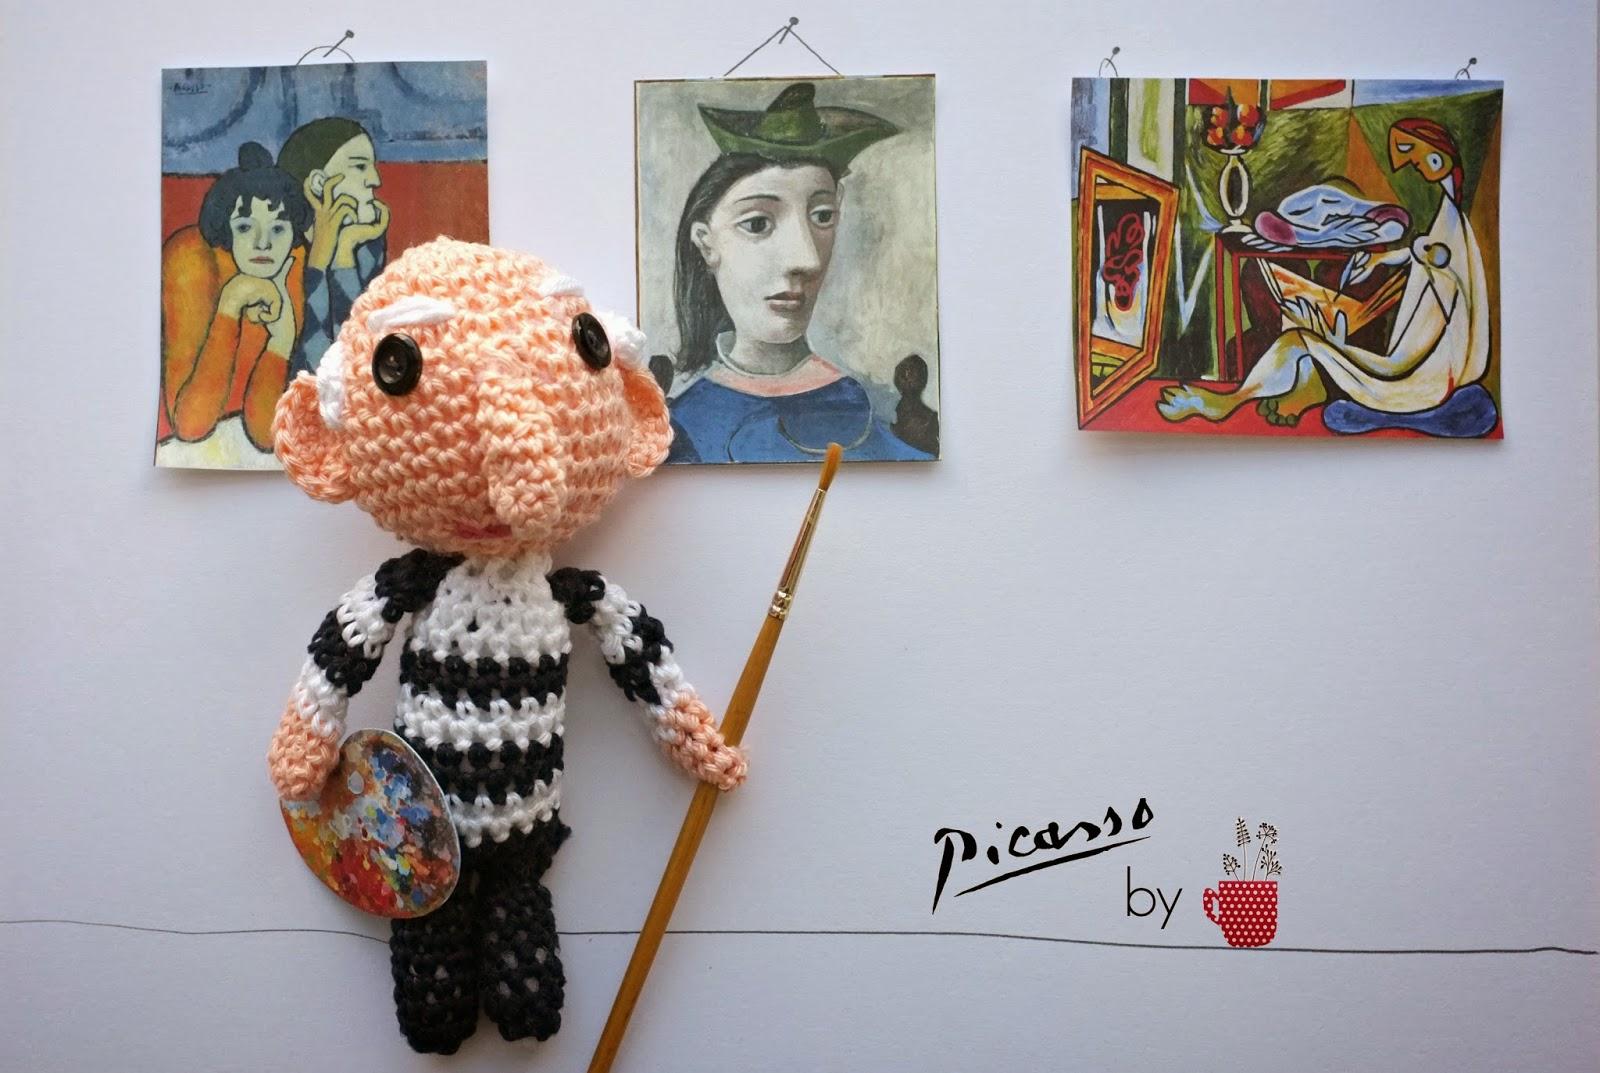 picasso peintre amigurumi crochet yard julie adore